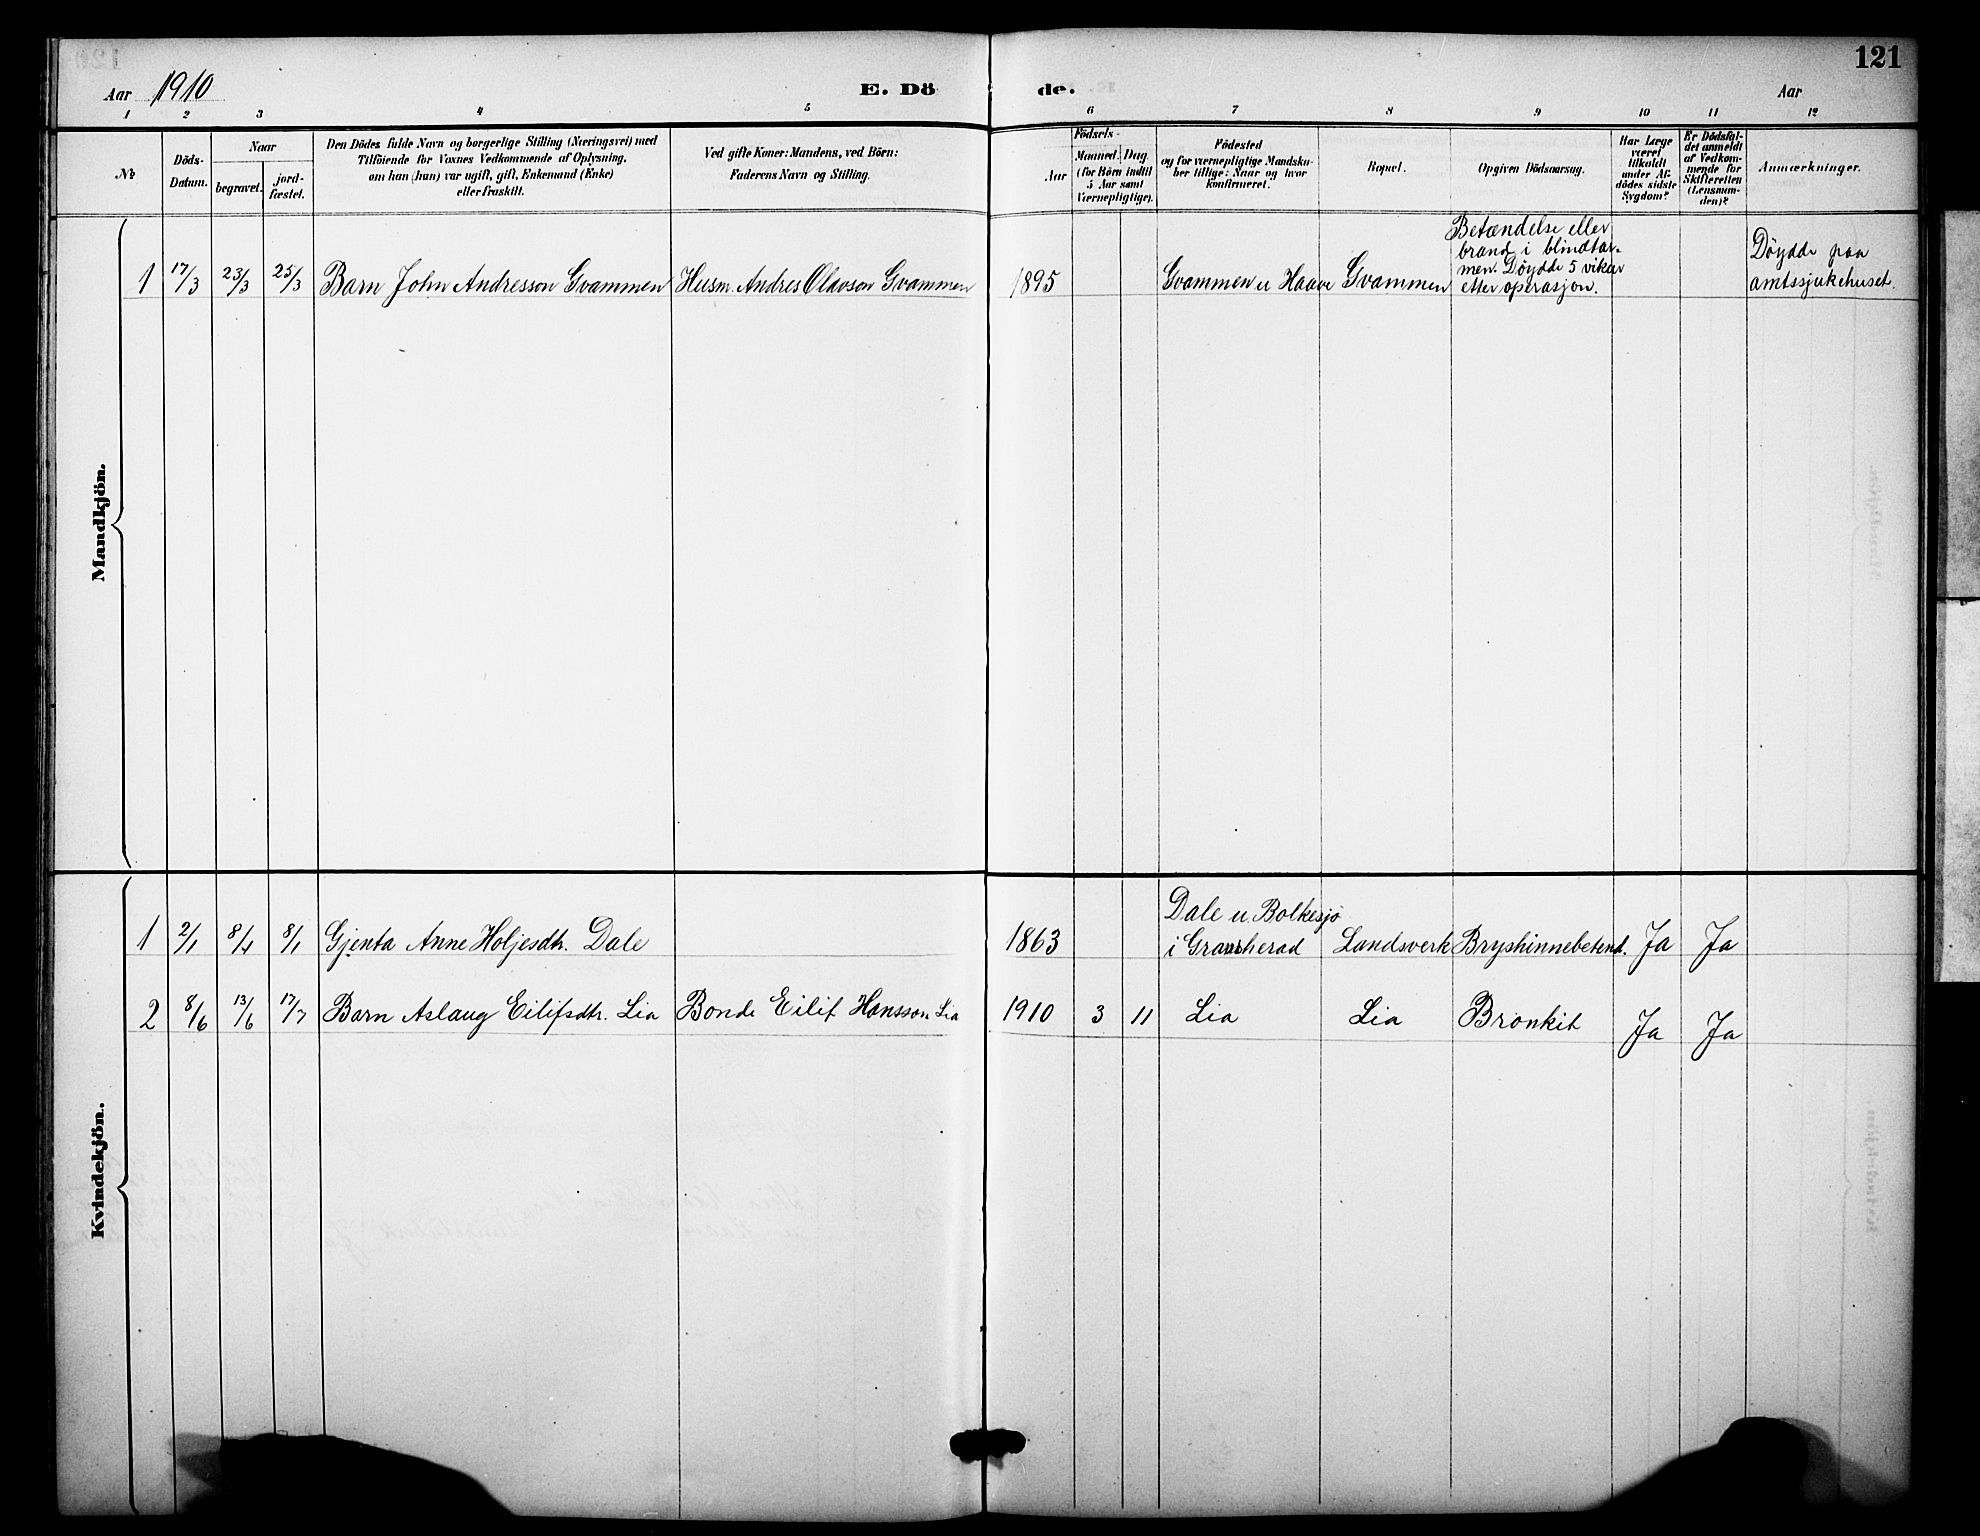 SAKO, Heddal kirkebøker, F/Fb/L0001: Ministerialbok nr. II 1, 1884-1910, s. 121